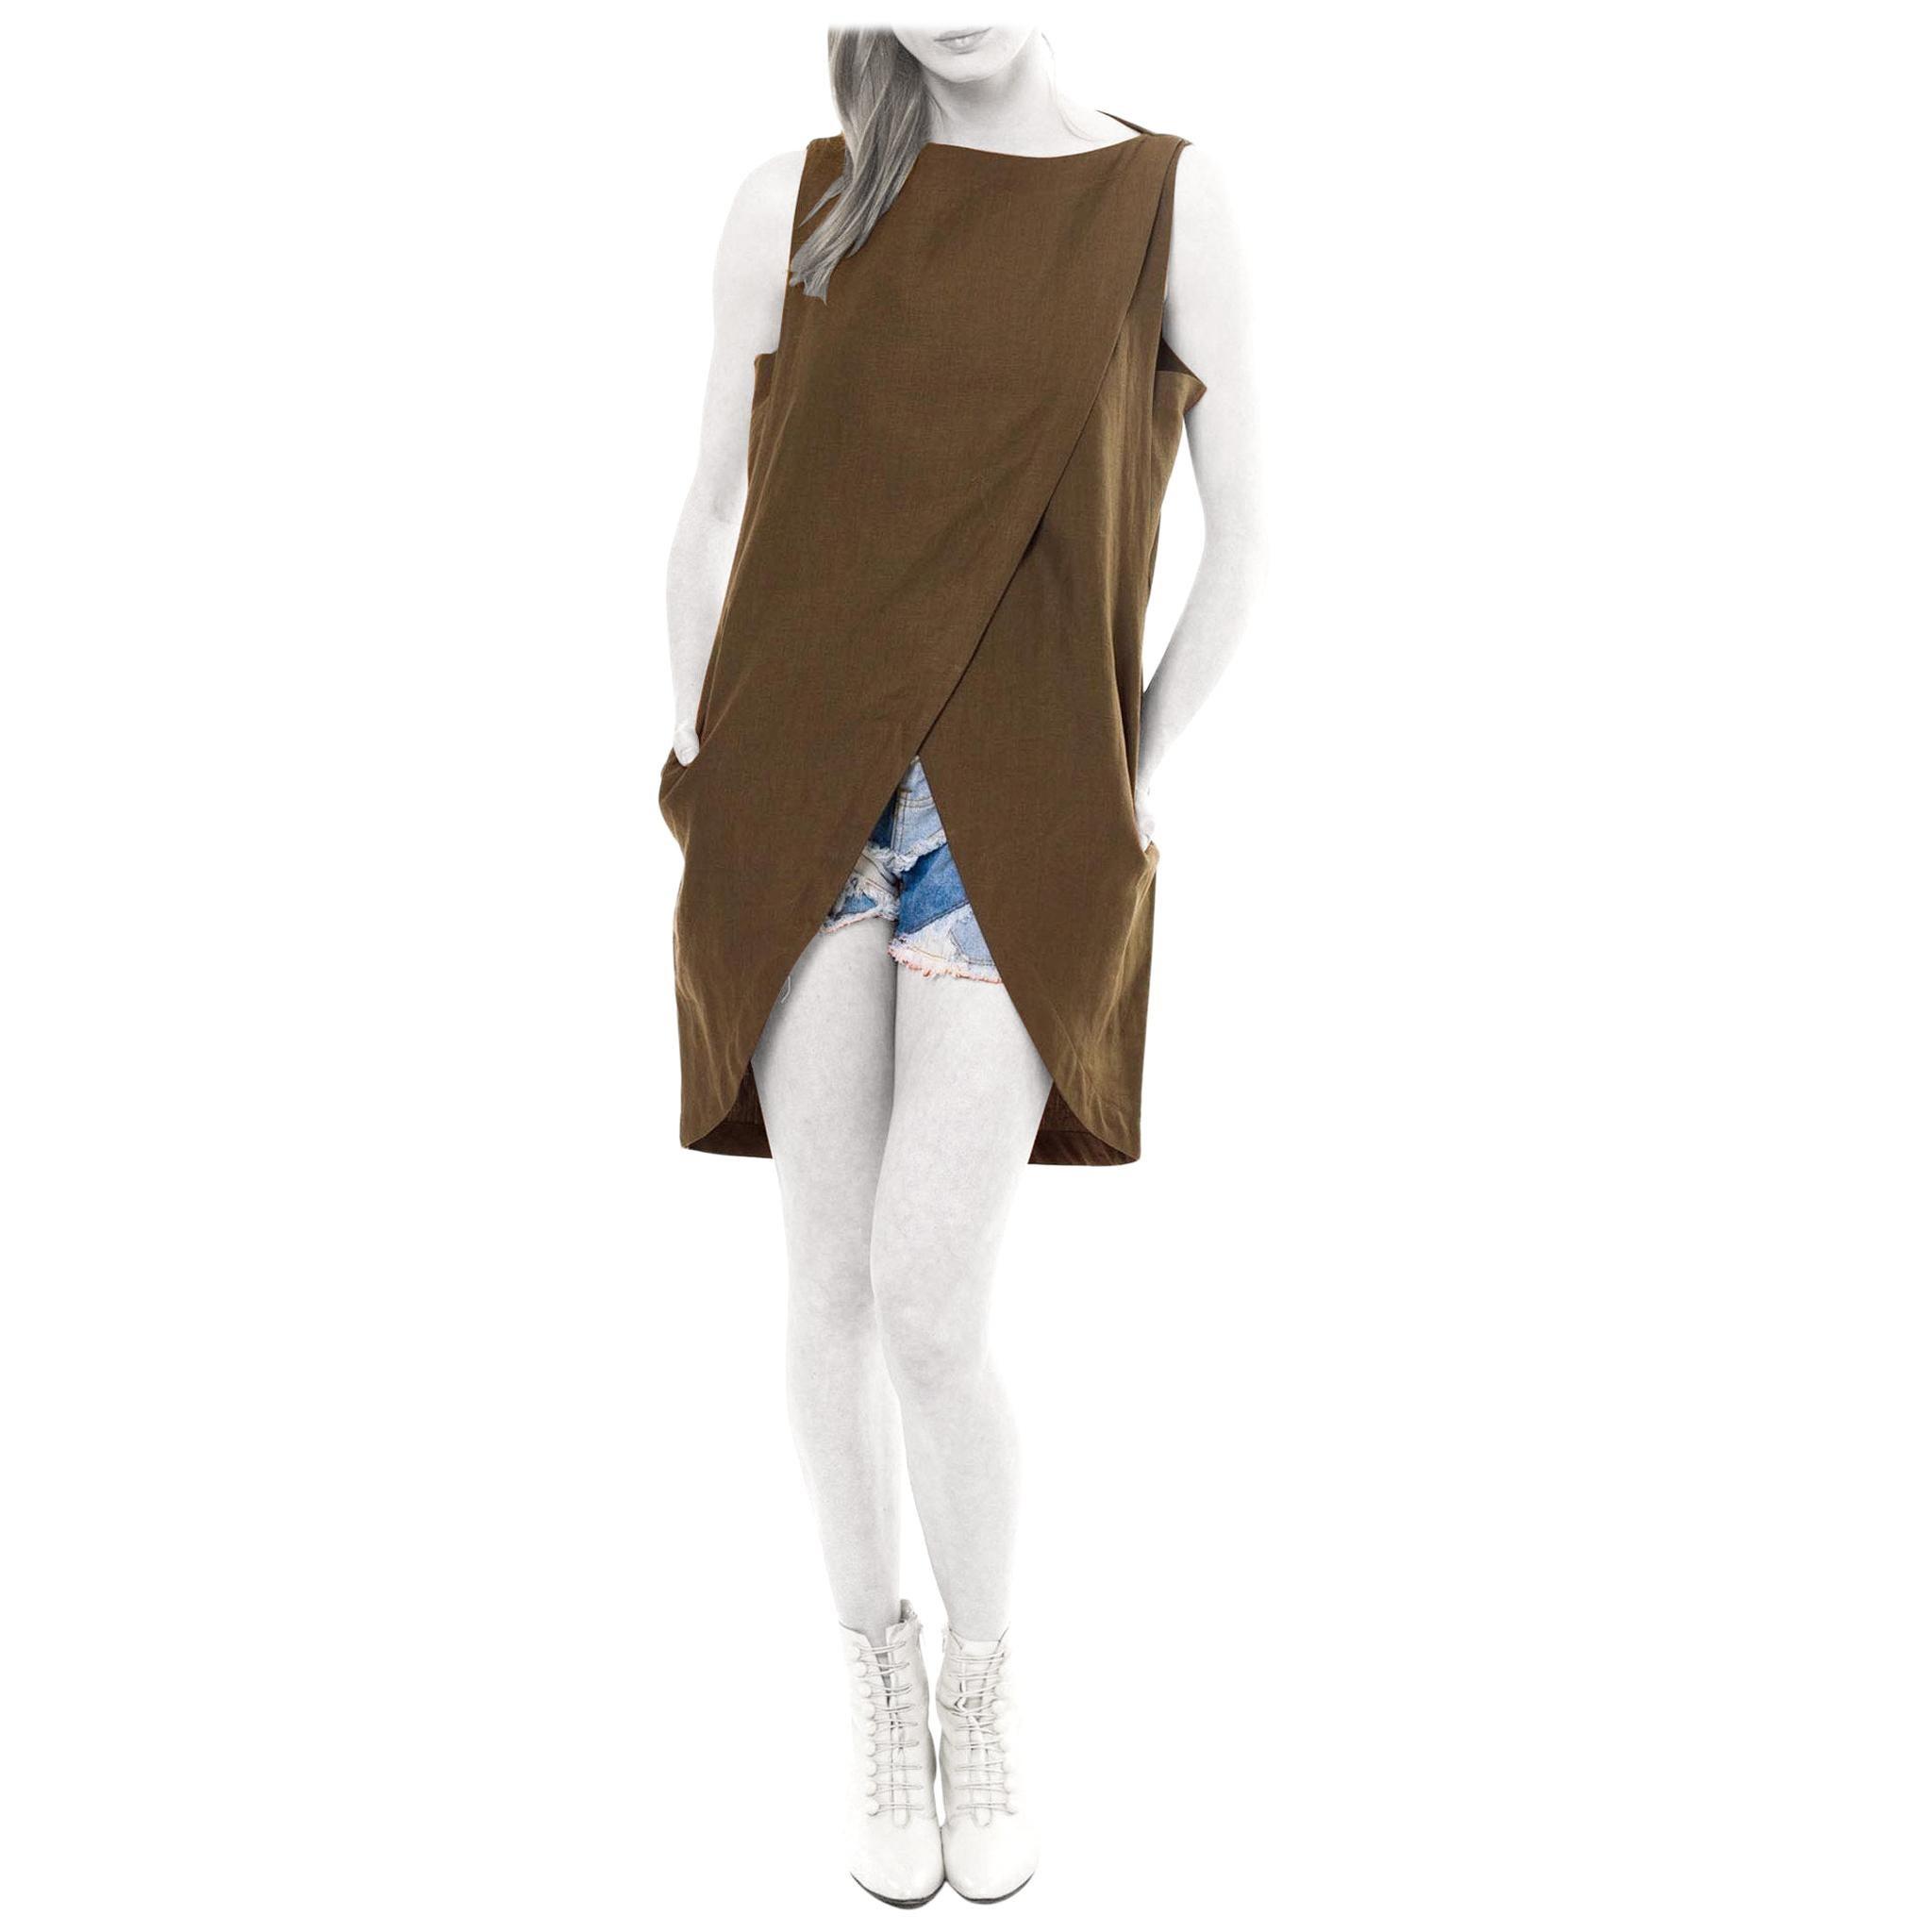 1980S BYBLOS Olive Green Linen Hi Lo Top With Pockets